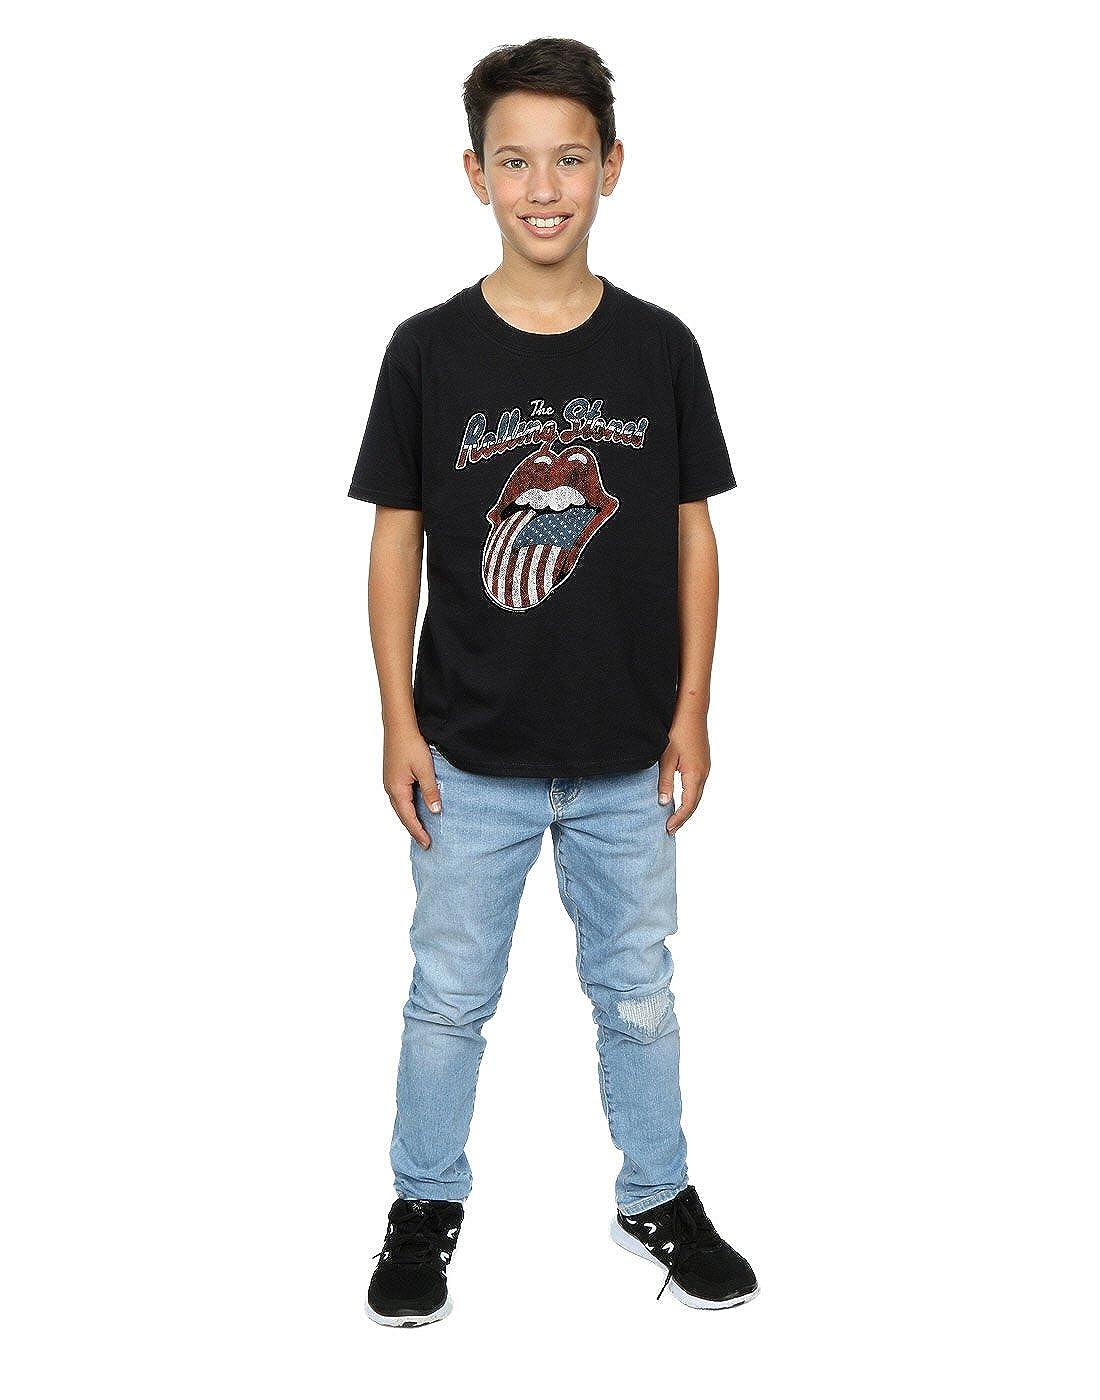 Rolling Stones ni/ños Tour of America Camiseta